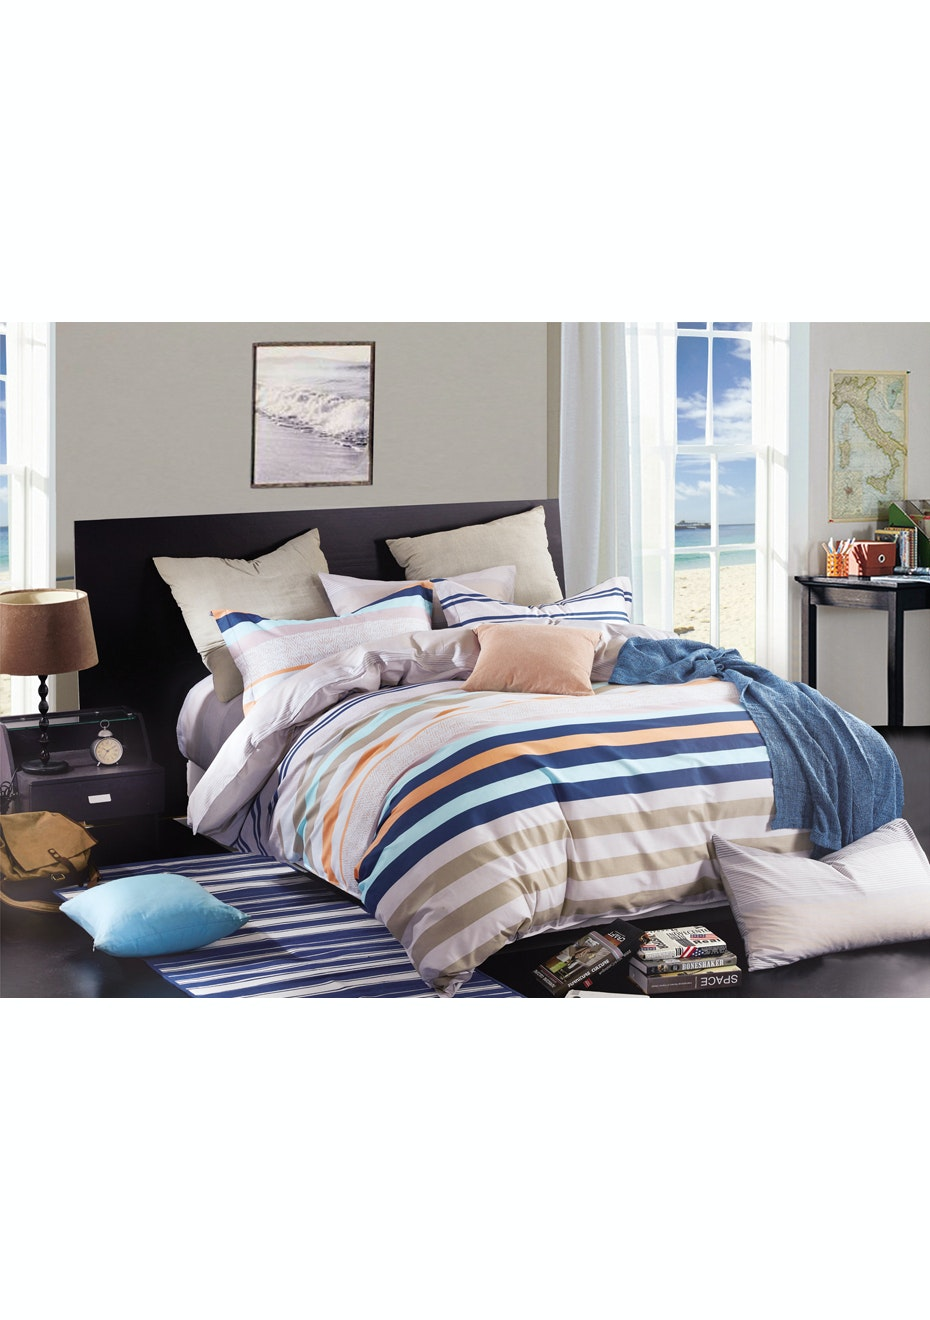 Sunset Quilt Cover Set - Reversible Design - 100% Cotton Double Bed